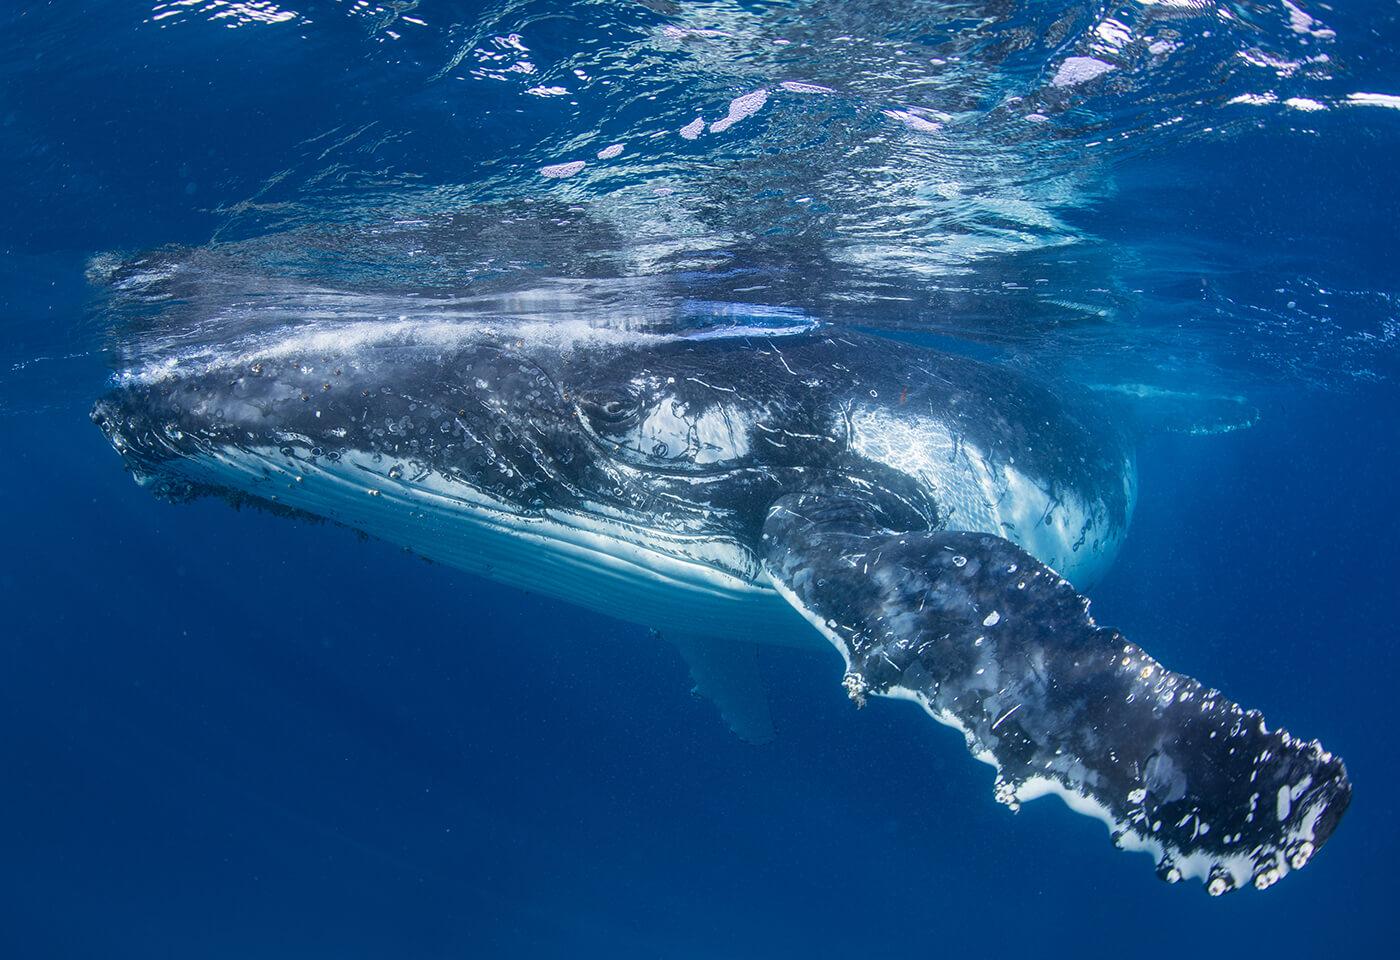 Landscape image of whales